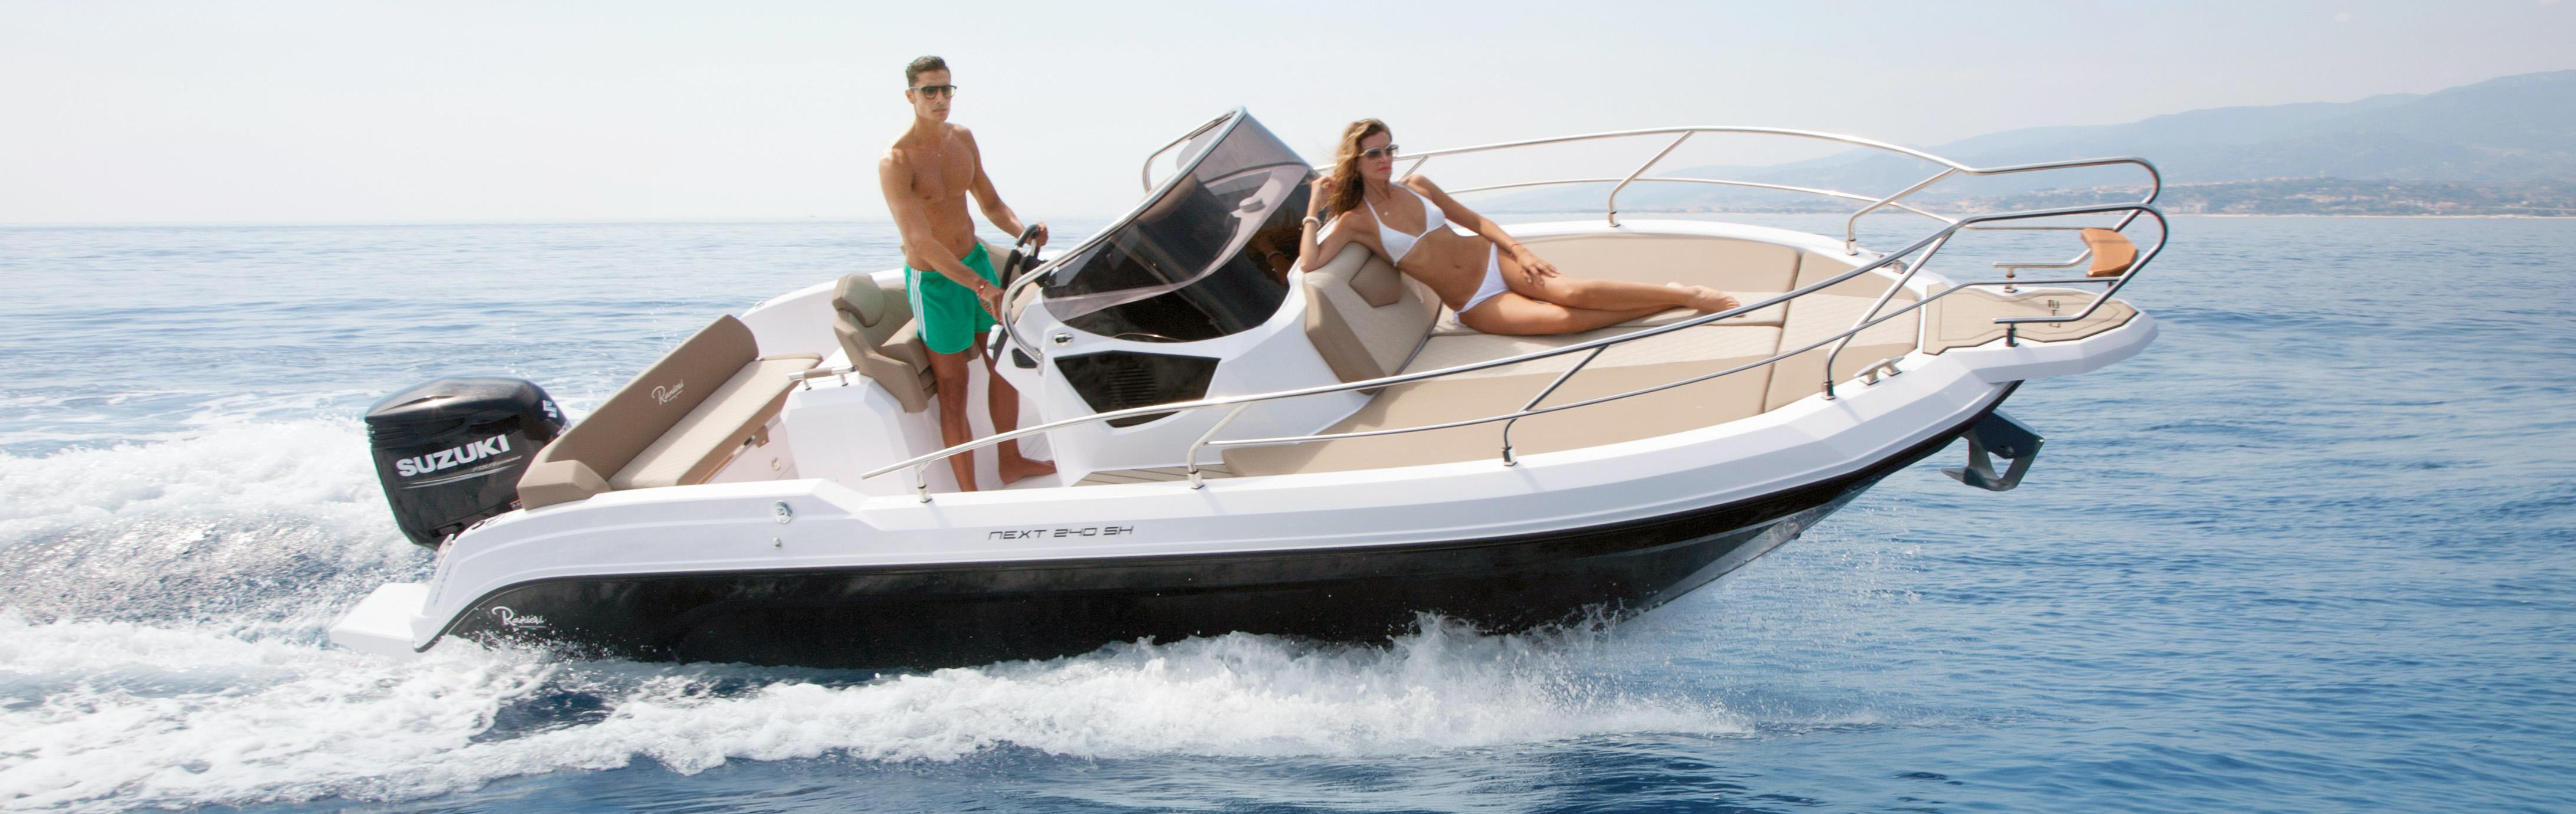 www.amber-yachting.com Ranieri Next 240 à vendre - alpes maritimes